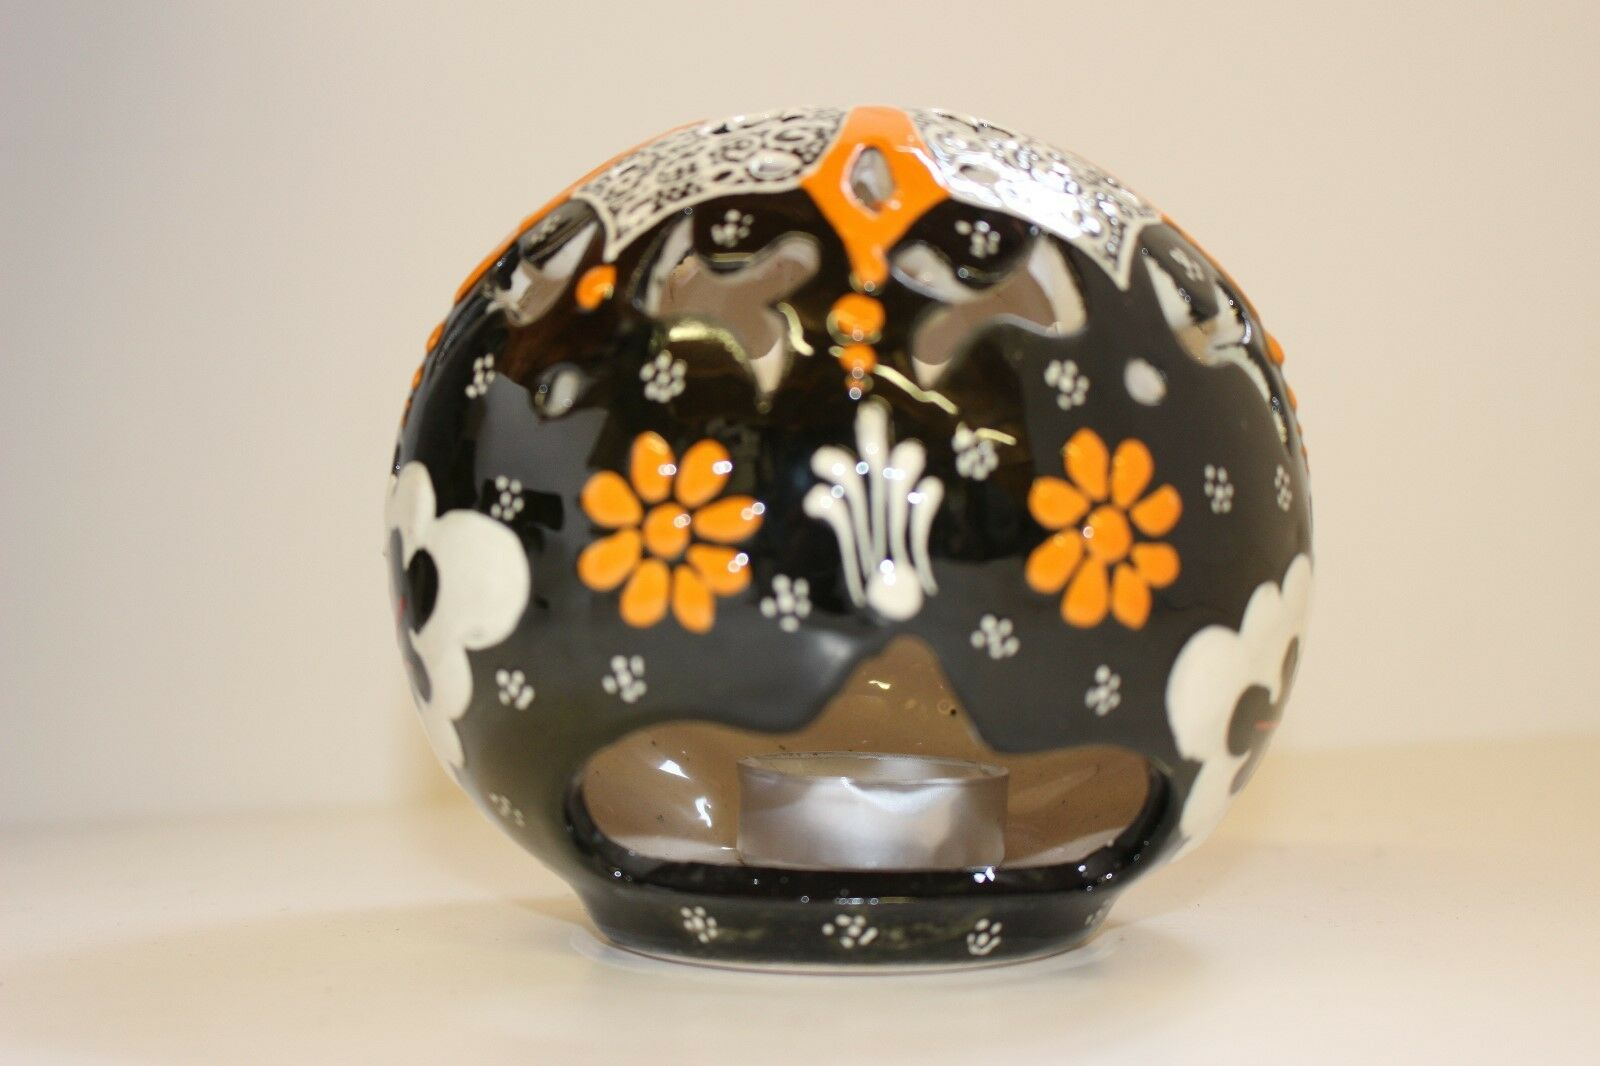 Azerbaijani Tea Light Candle Holder Handmade Lantern Decorative Home Decor